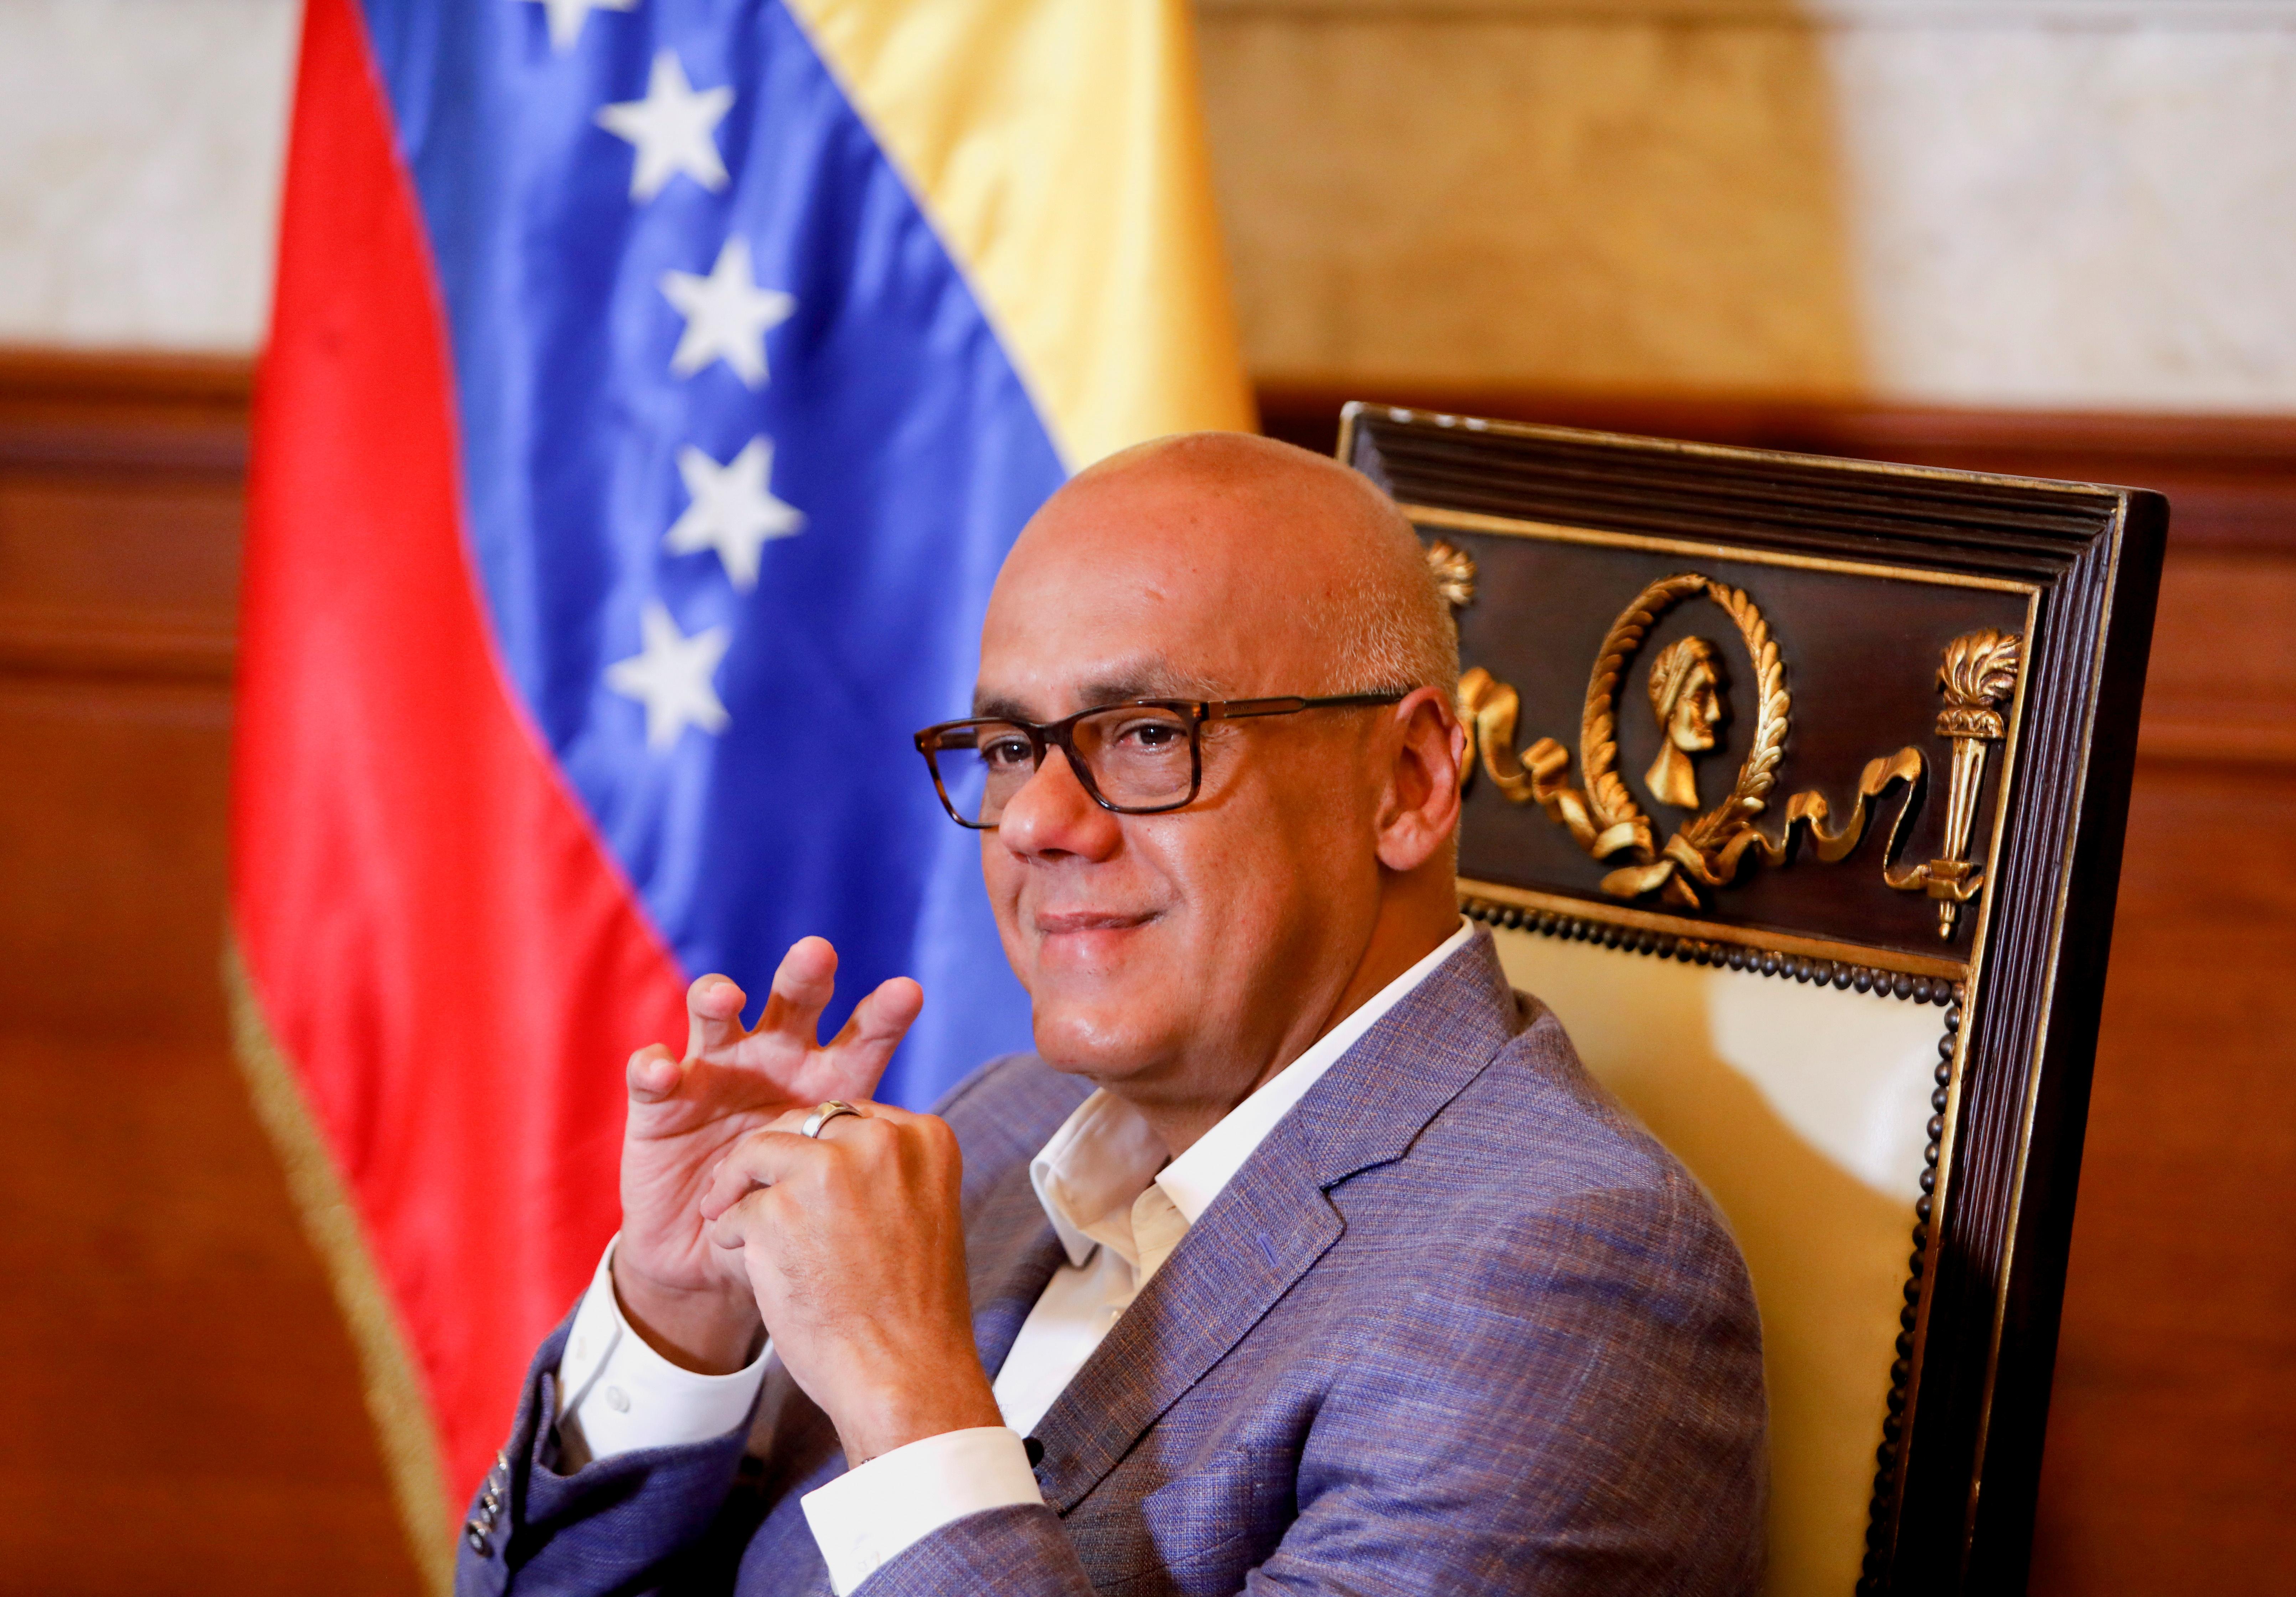 Jorge Rodriguez, head of Venezuela's National Assembly, talks with Reuters in Caracas, Venezuela April 26, 2021. REUTERS/Leonardo Fernandez Viloria